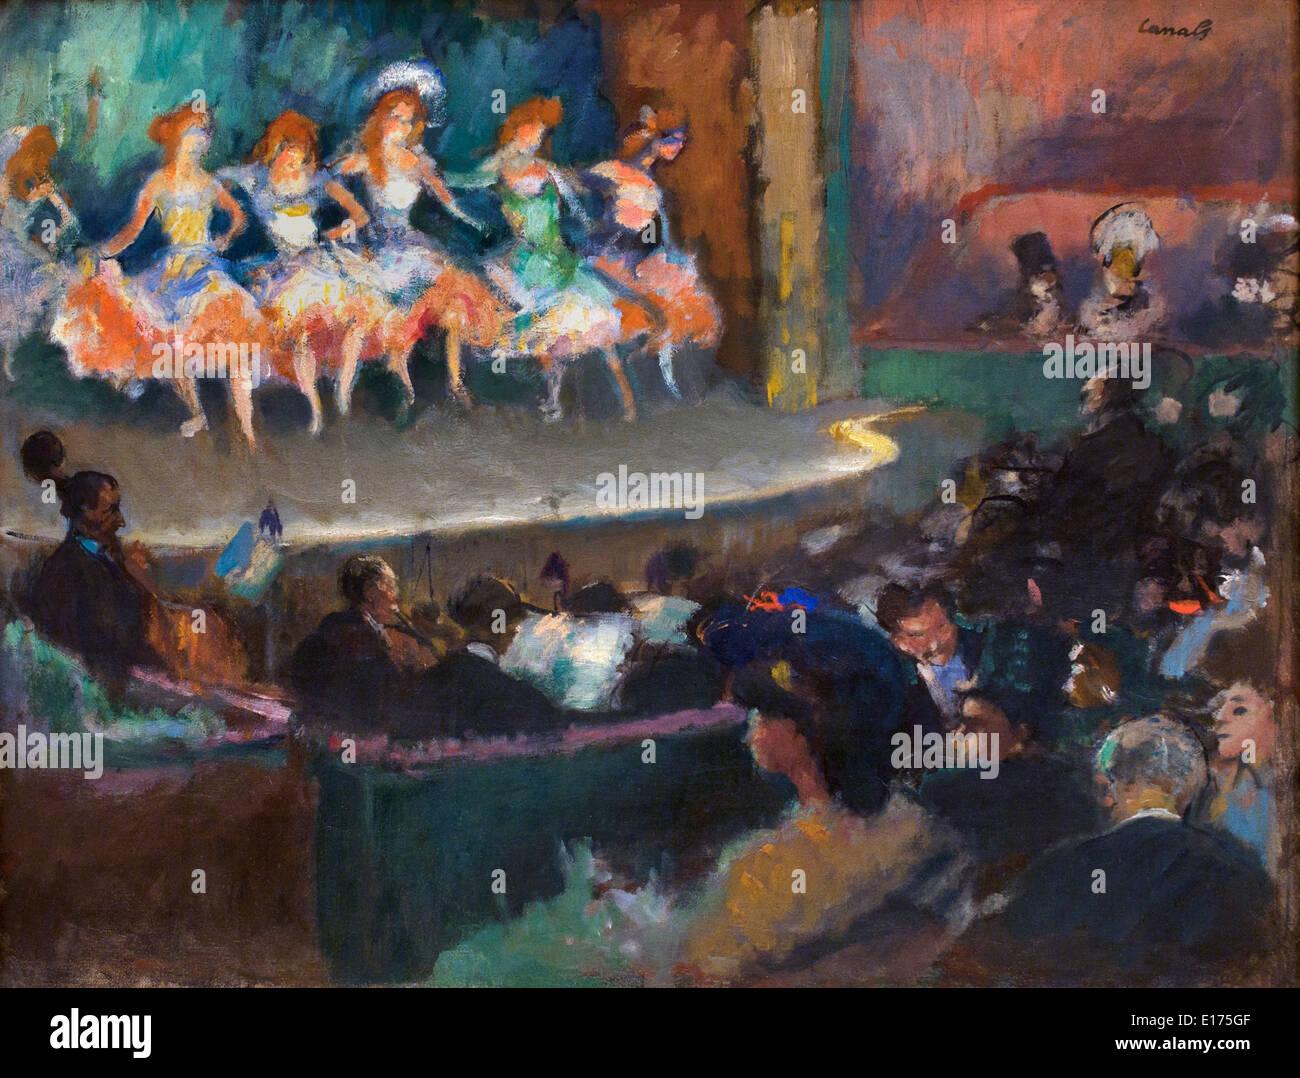 Café concert 1903 Ricard Canals 1876-1931 Spain Spanish - Stock Image